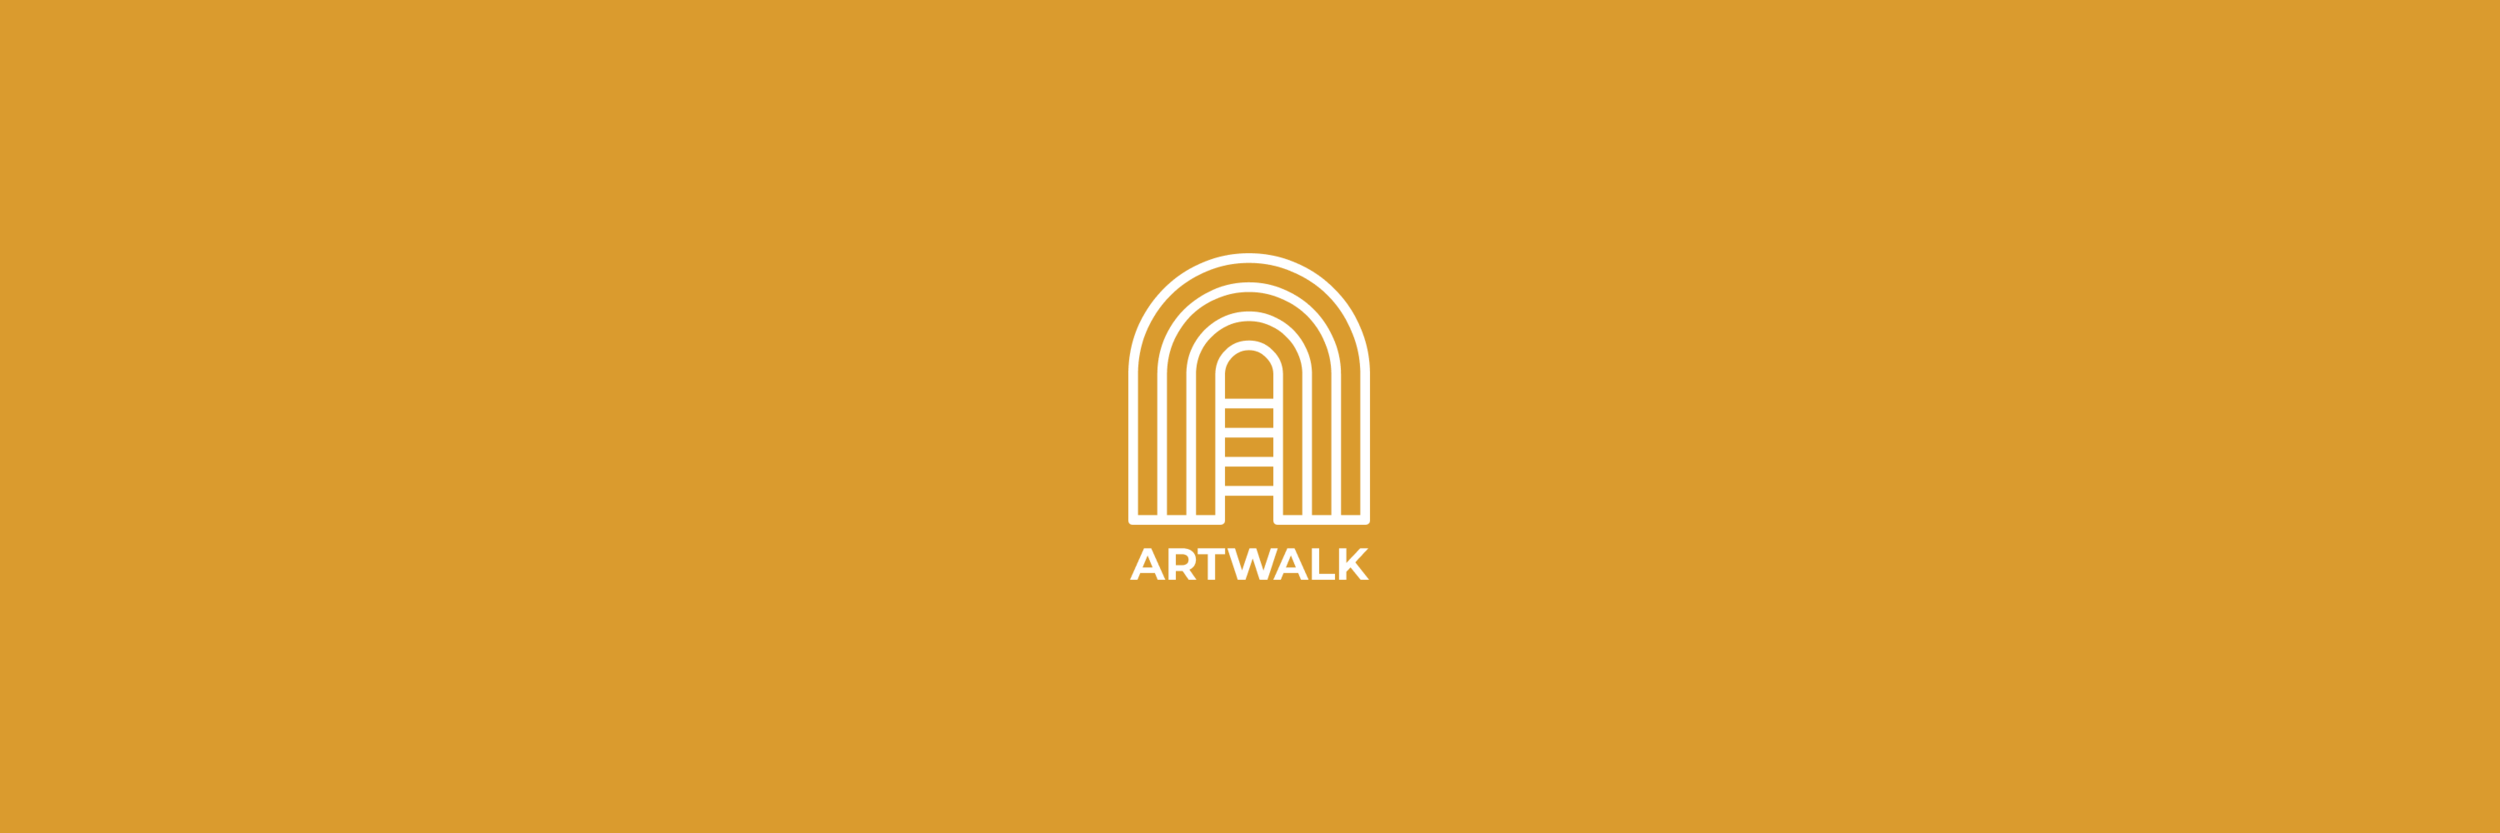 Artwalk_Header.png